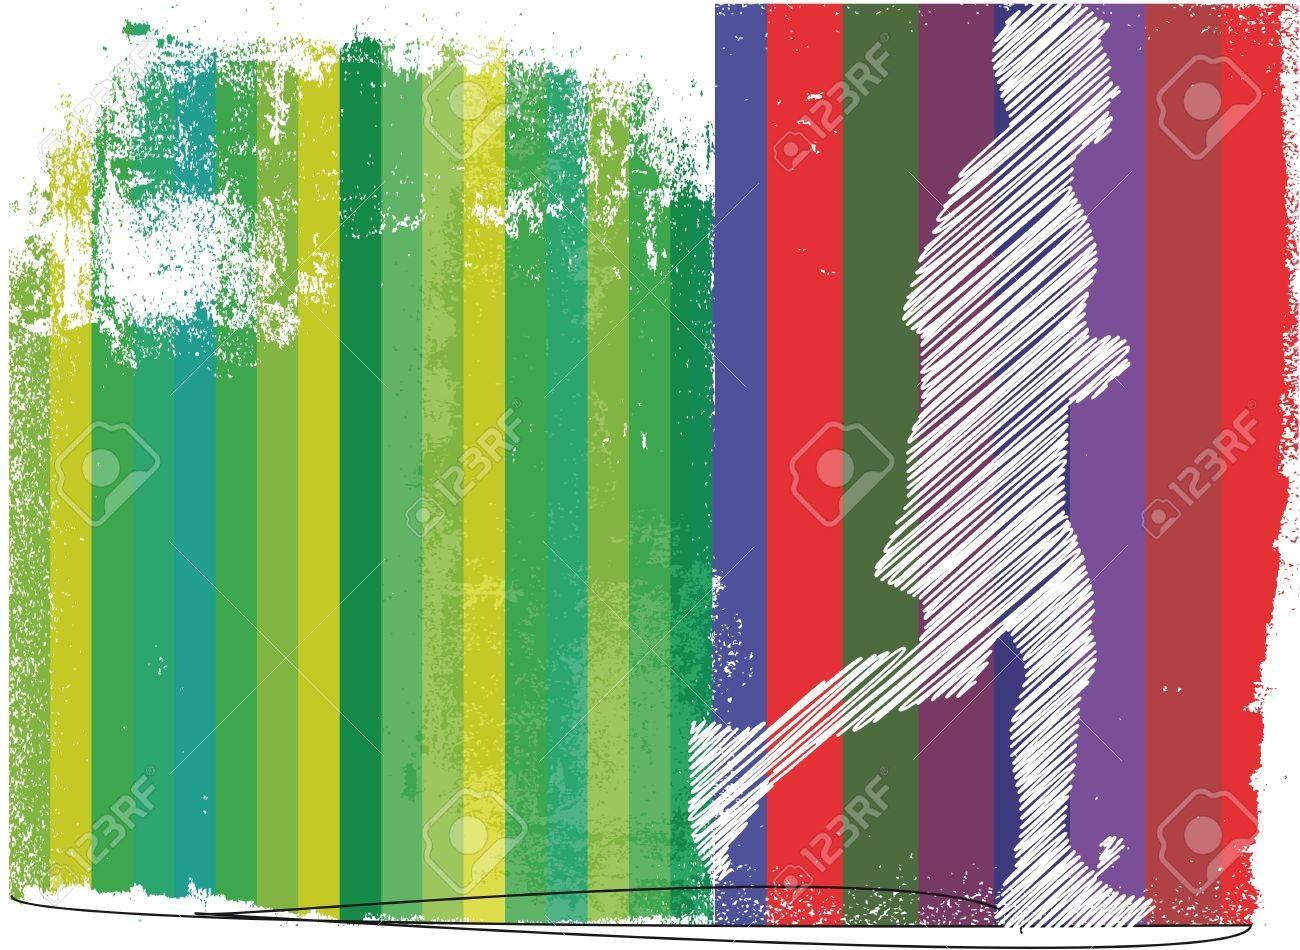 Marathon runner in abstract background. Vector illustration Stock Vector - 11370686